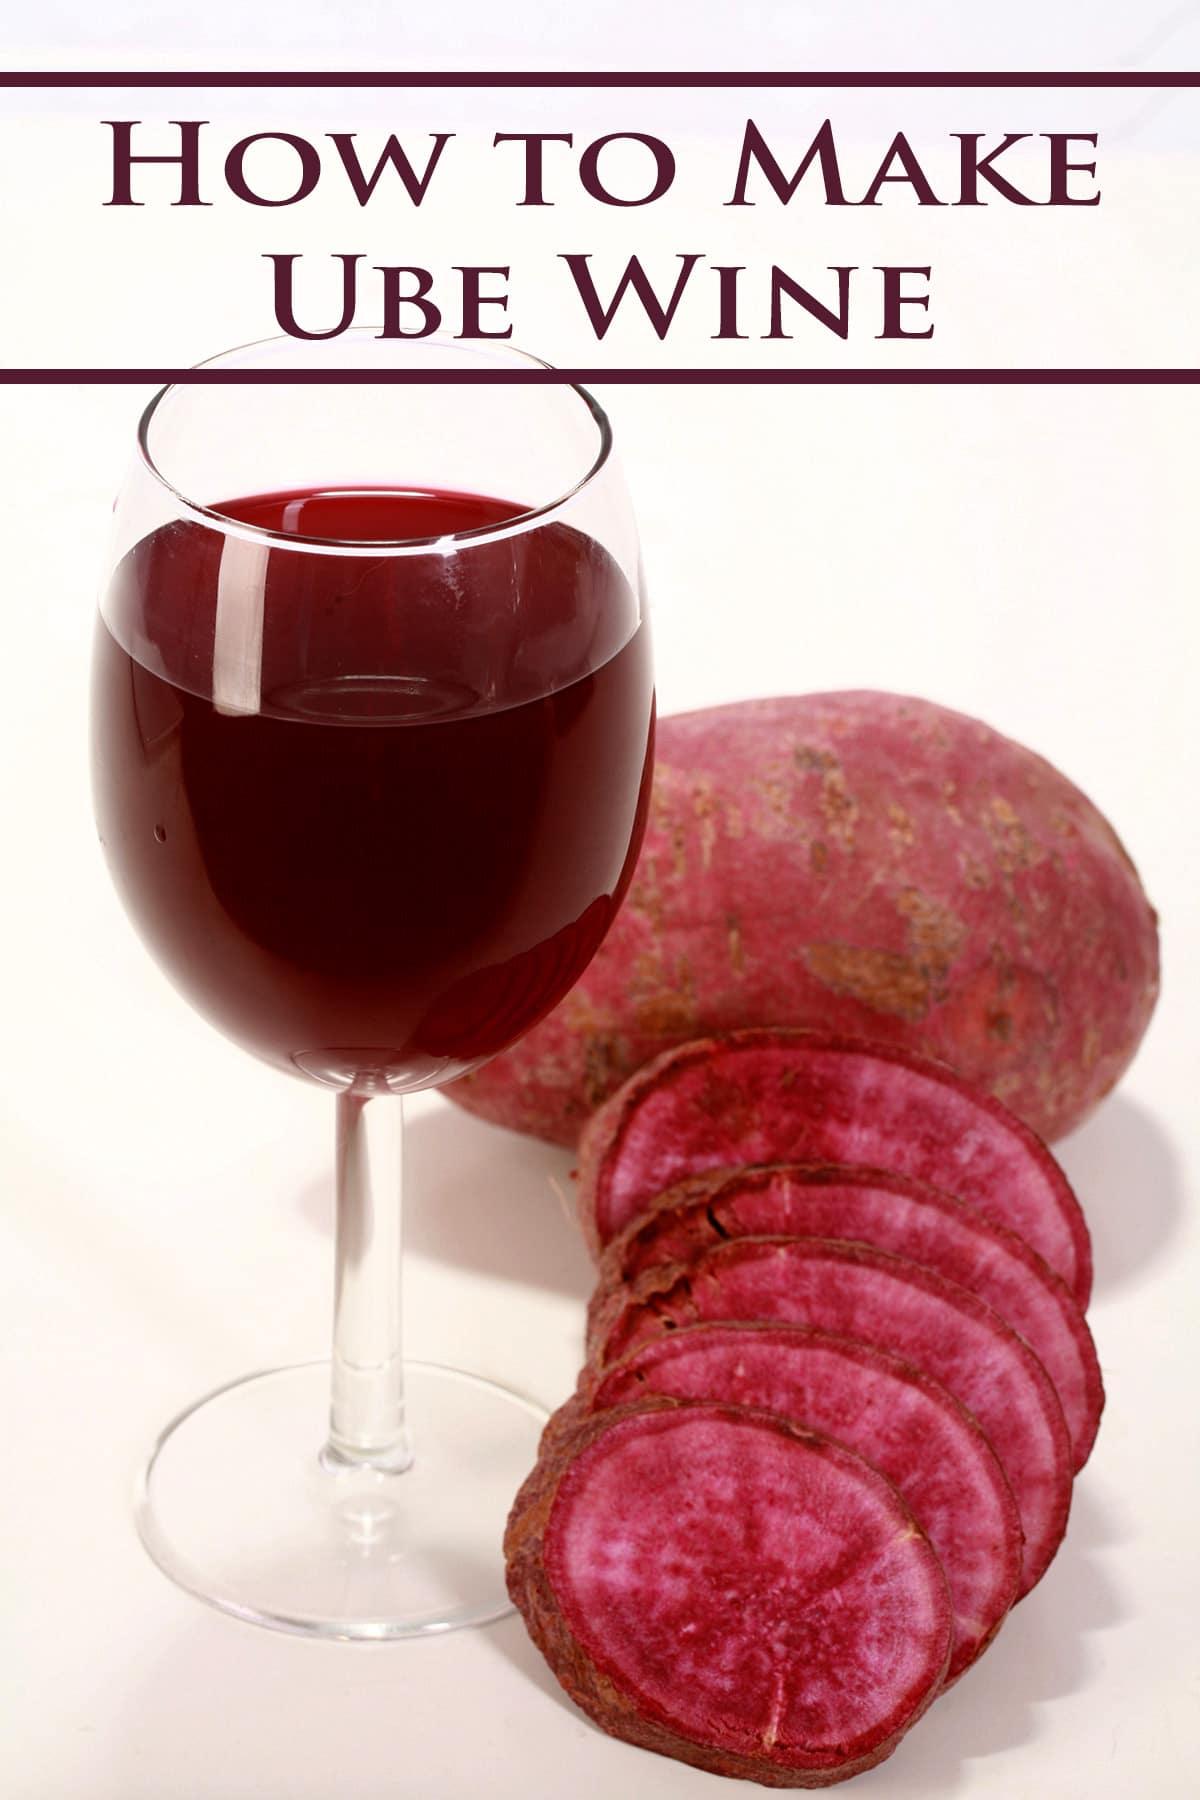 A wine glass with deep purple ube wine, next to a sliced up ube - purple sweet potato.